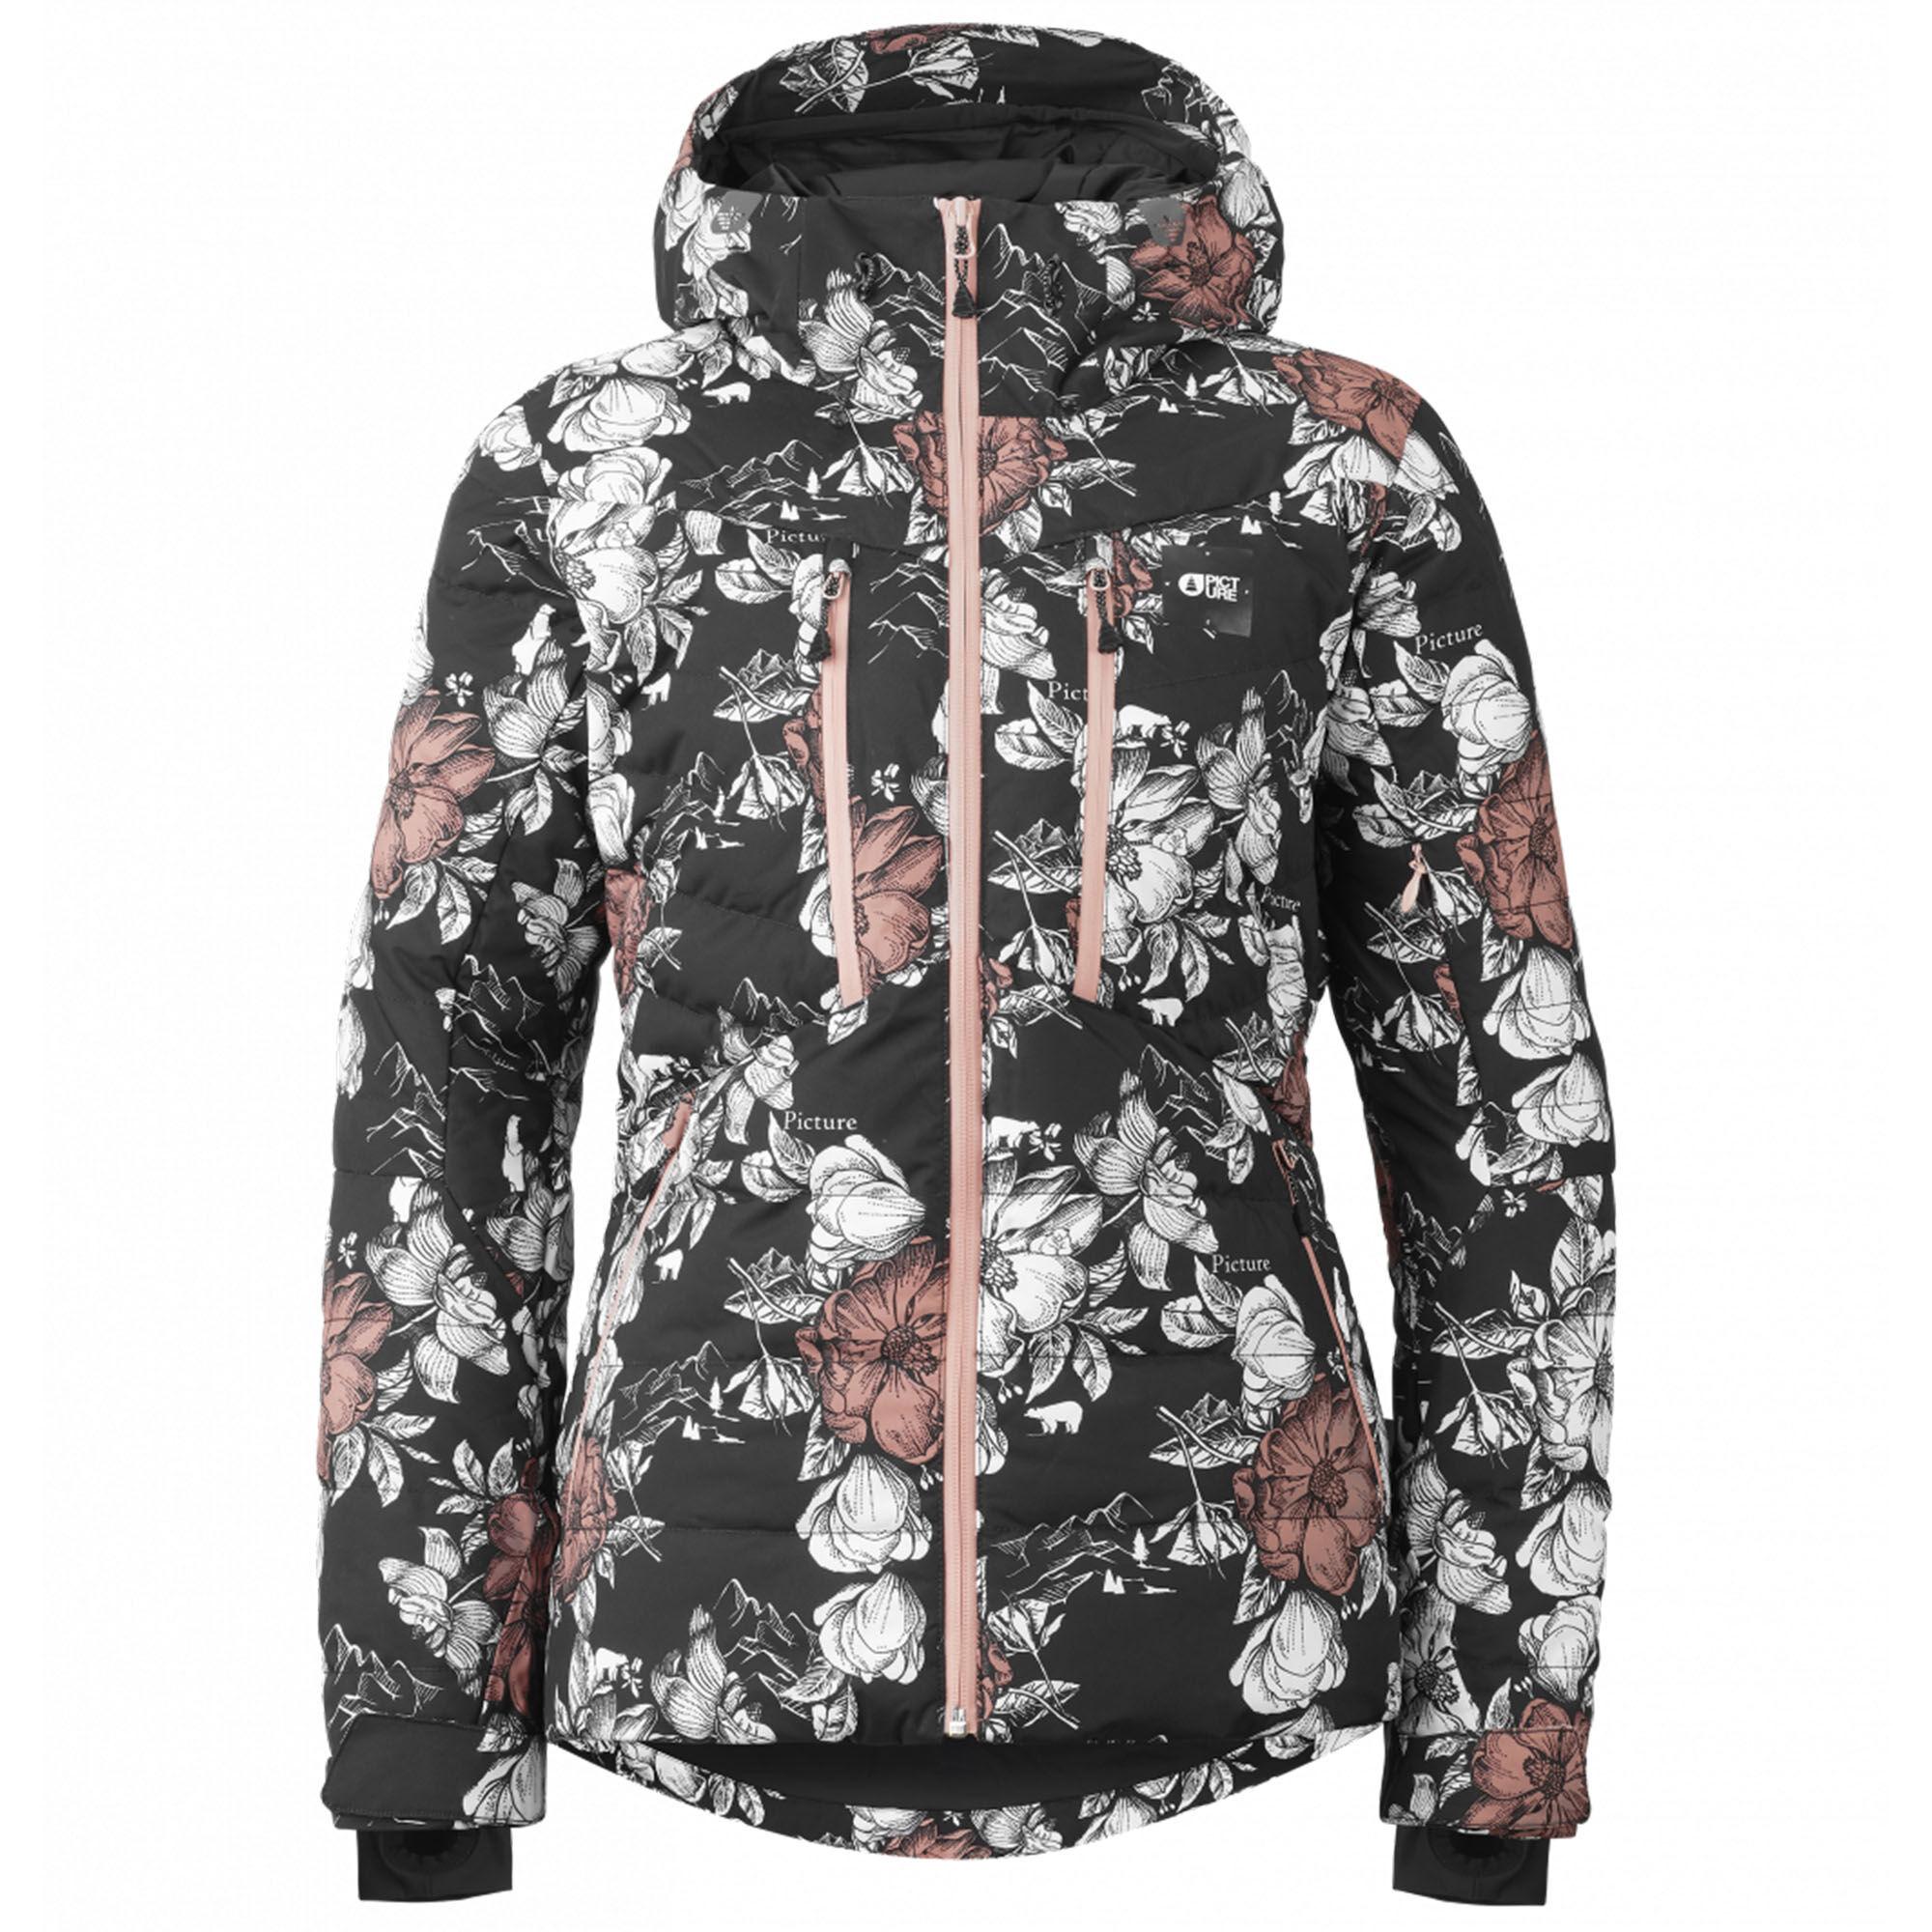 Picture Organic Clothing Women's Pluma Jacket  - Peonies Black - Size: Medium